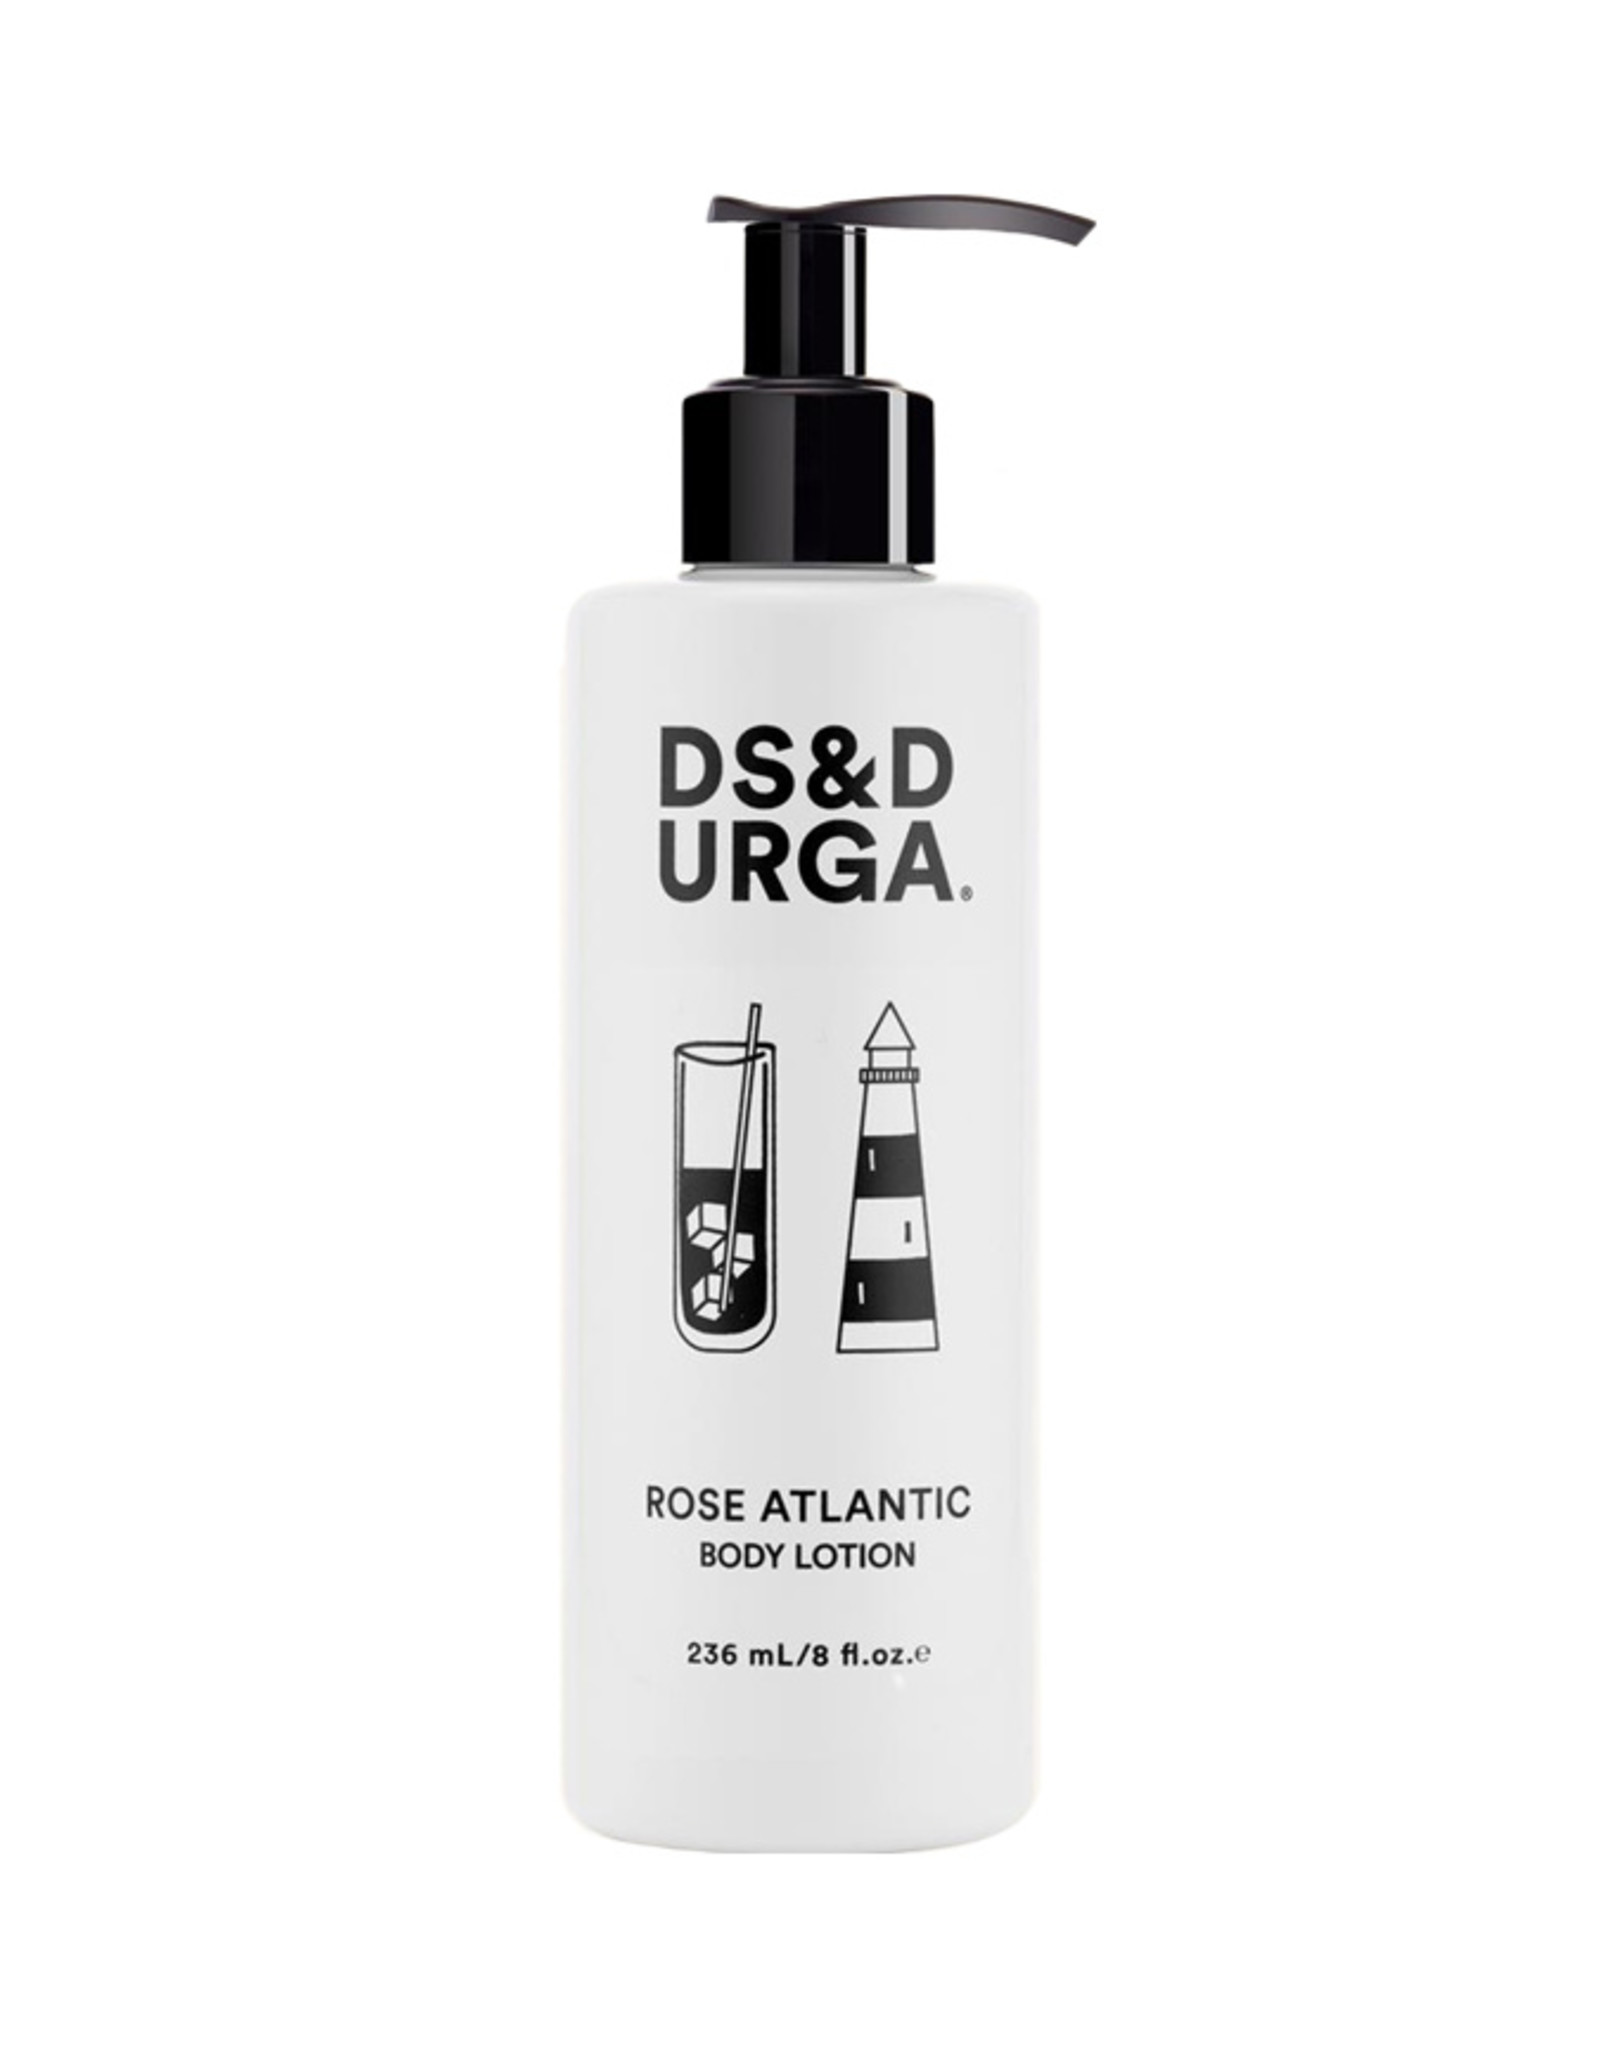 D.S. & DURGA Rose Atlantic - Body Lotion - 8oz. (236mL)